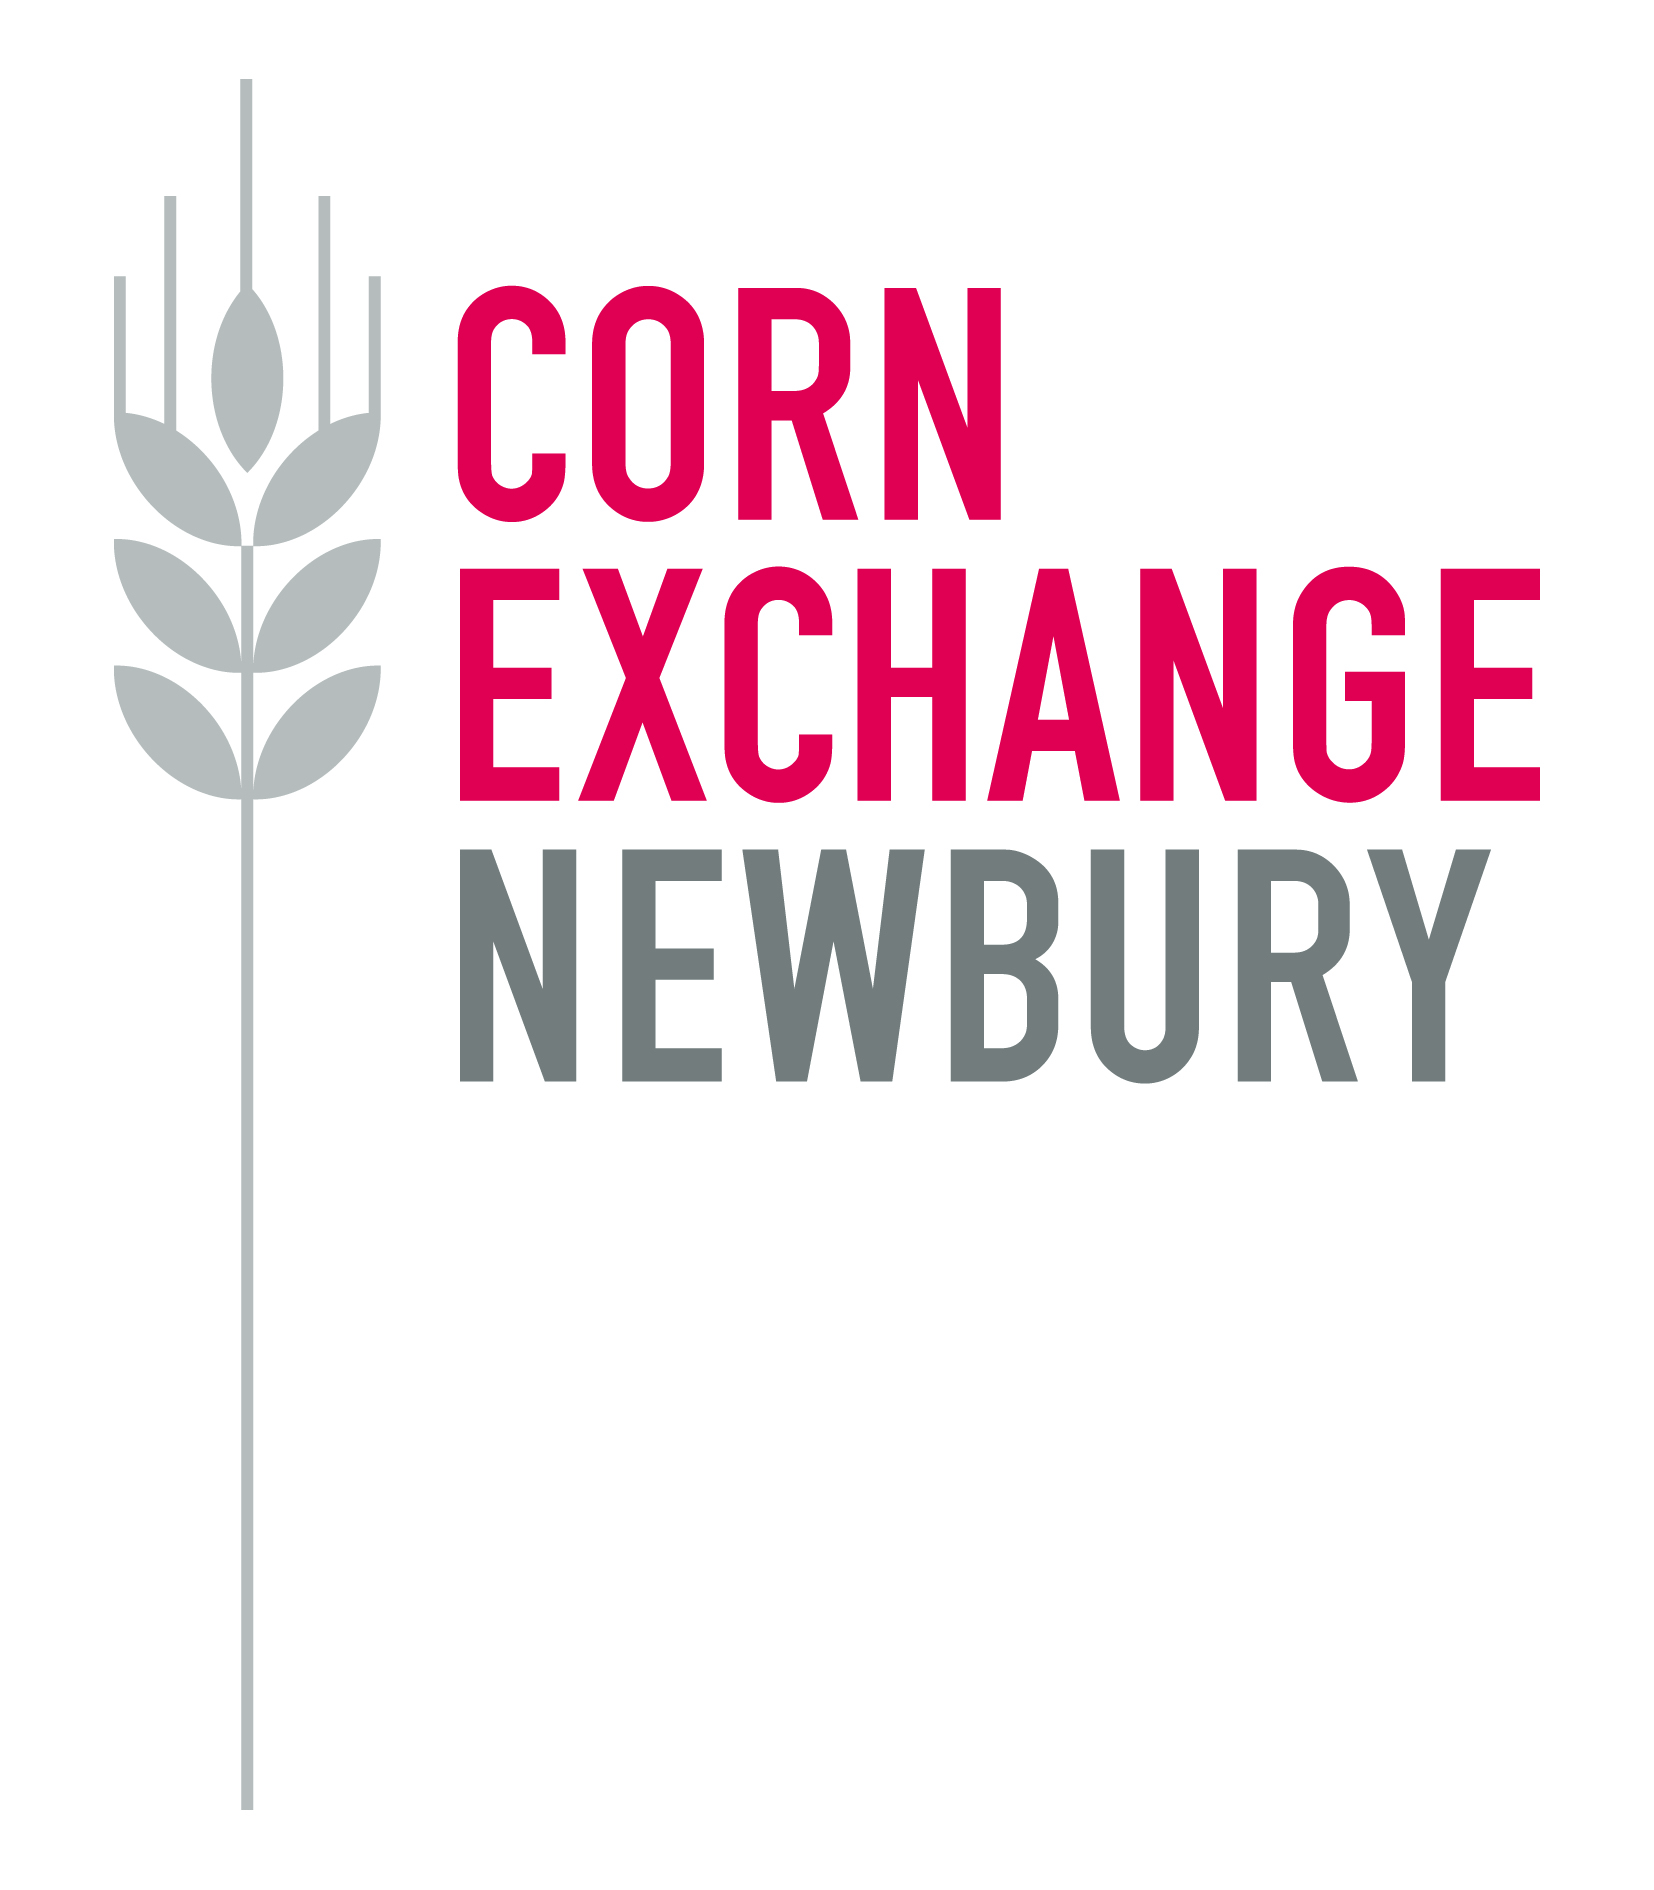 Corn Exchange Newbury